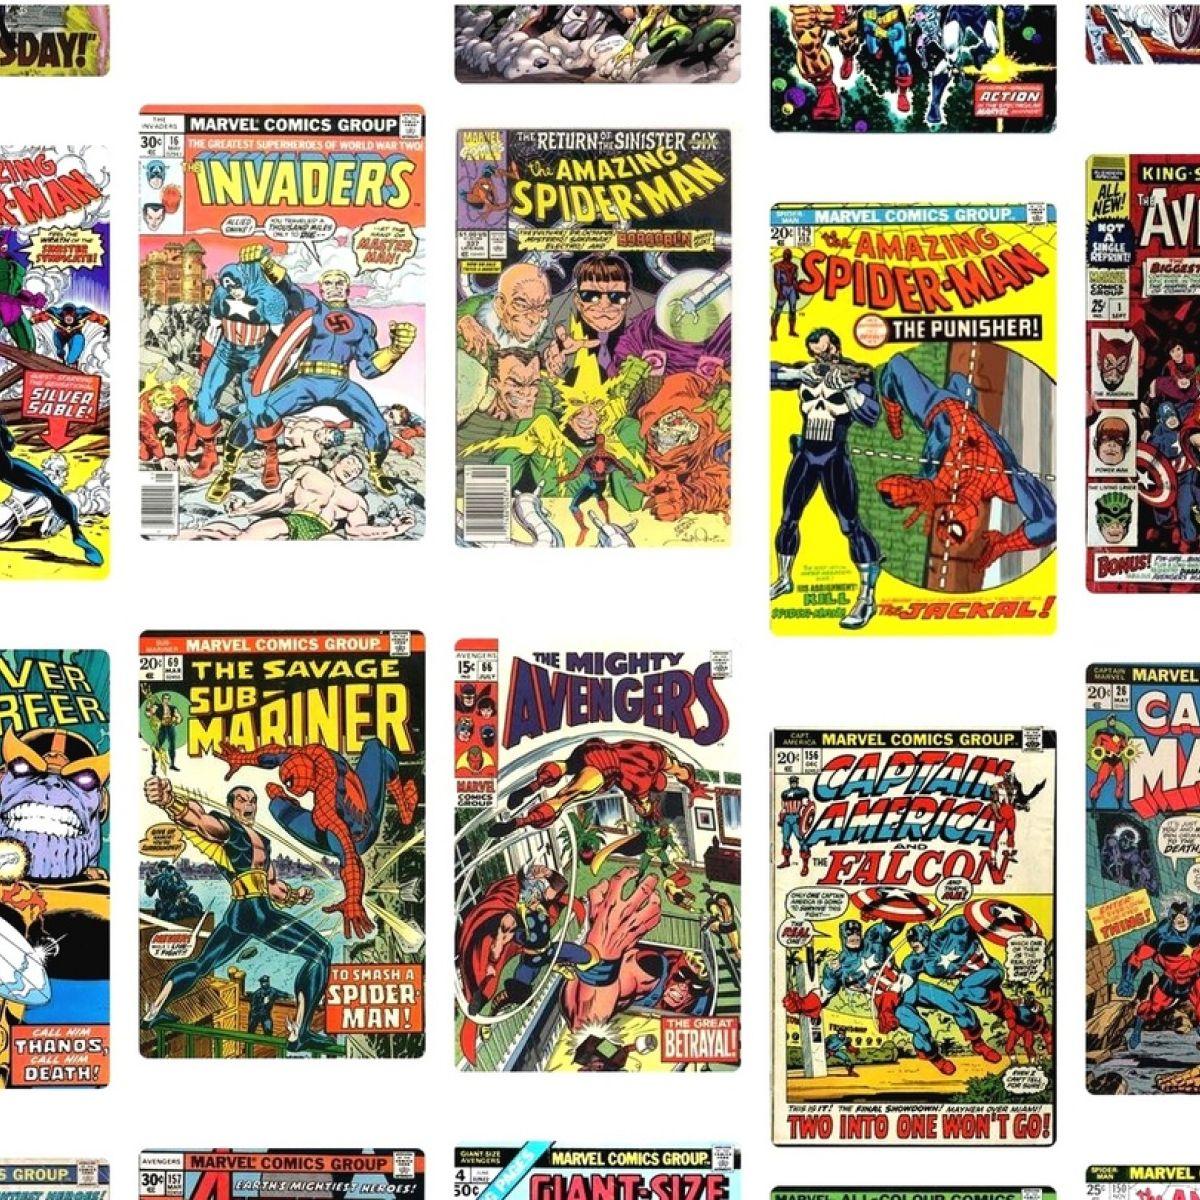 Patrick Freyne: Thank you, Stan Lee, for making superheroes just like us